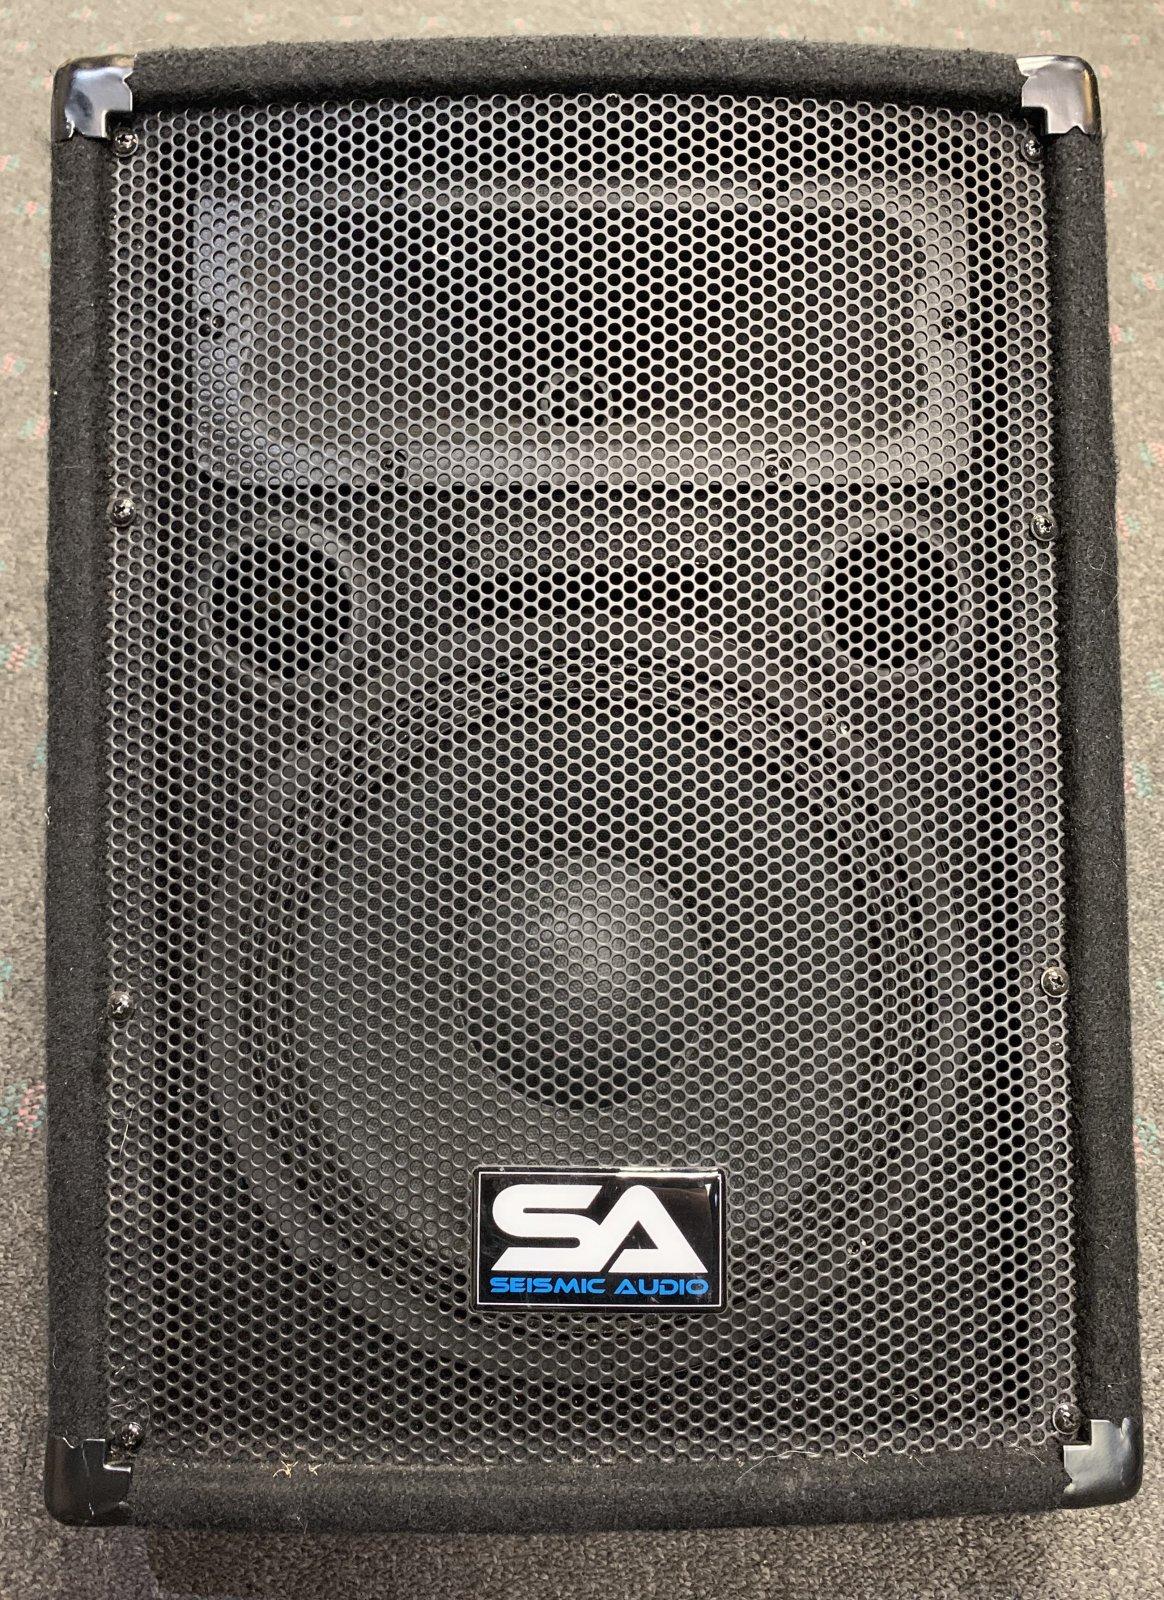 Used Seismic Audio SA-10M 10 Wedge Floor Stage Monitor or Speaker